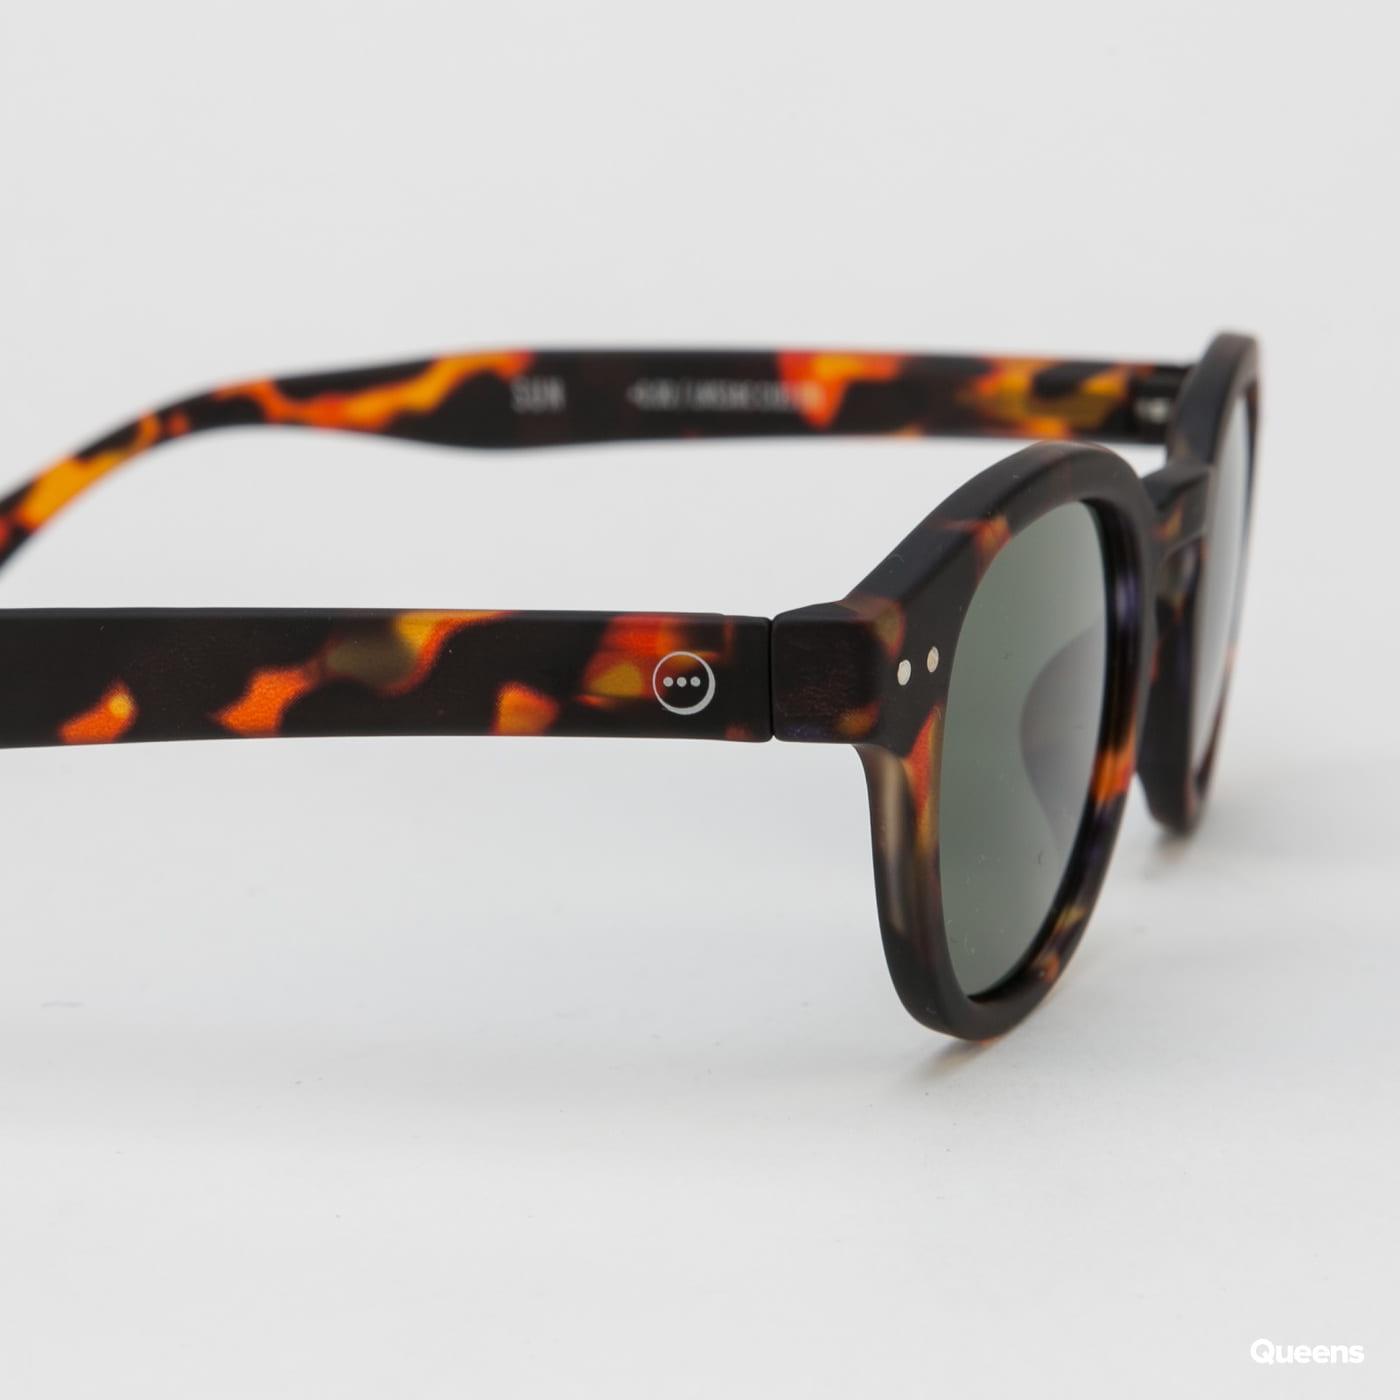 IZIPIZI Sunglasses #C brown / black